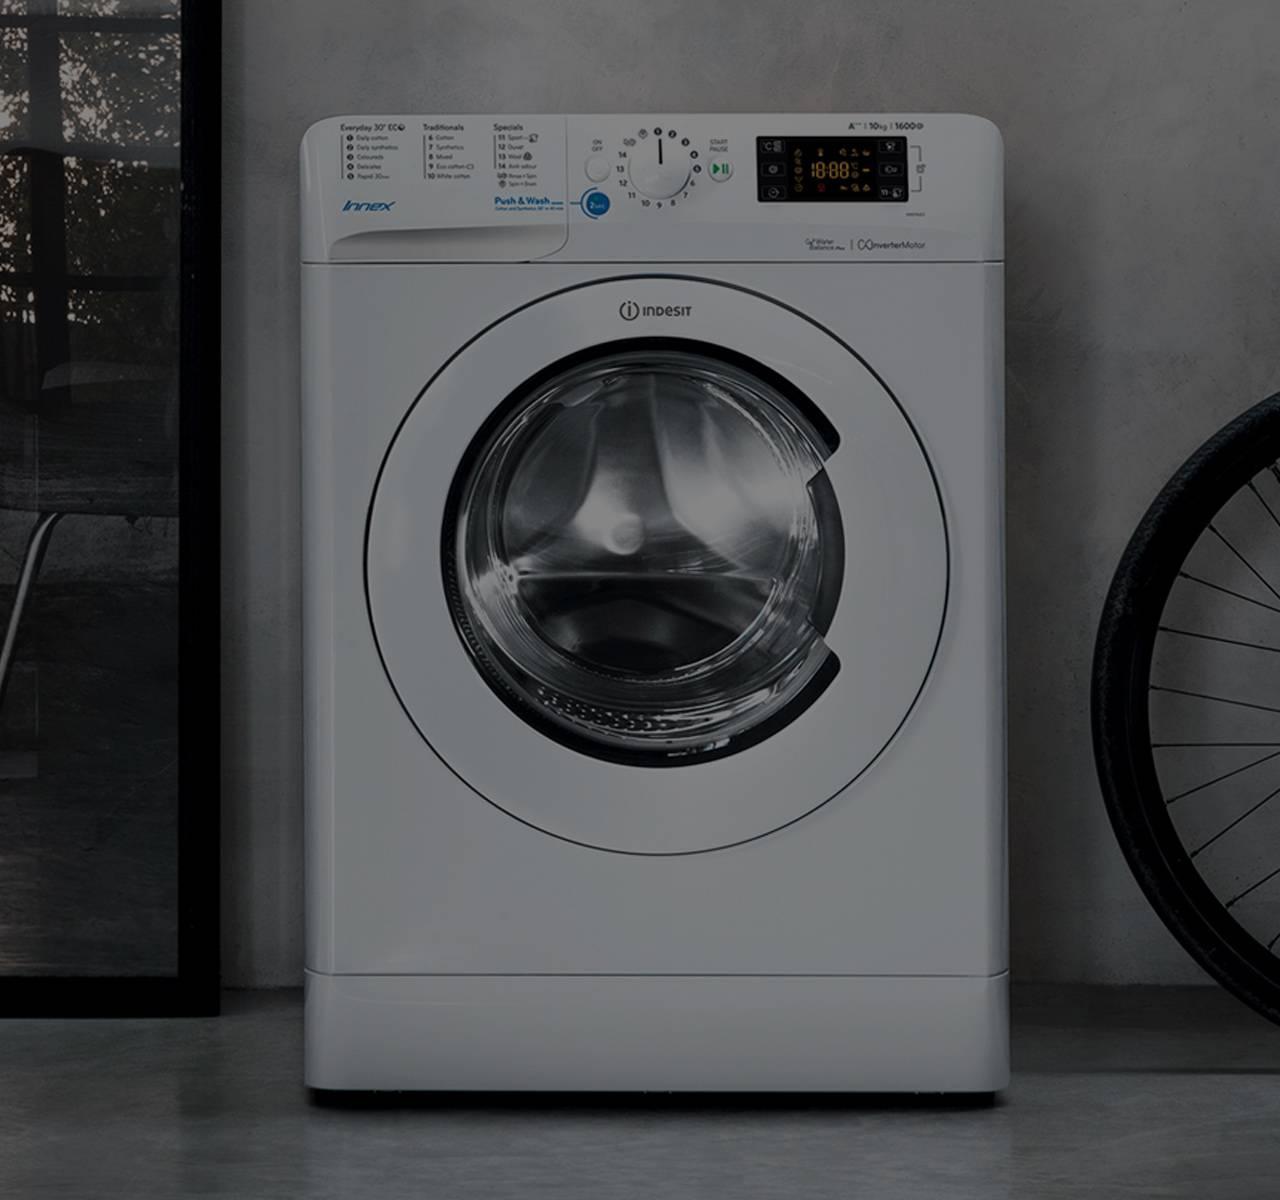 Lavatrici - Lavatrice cucina ...